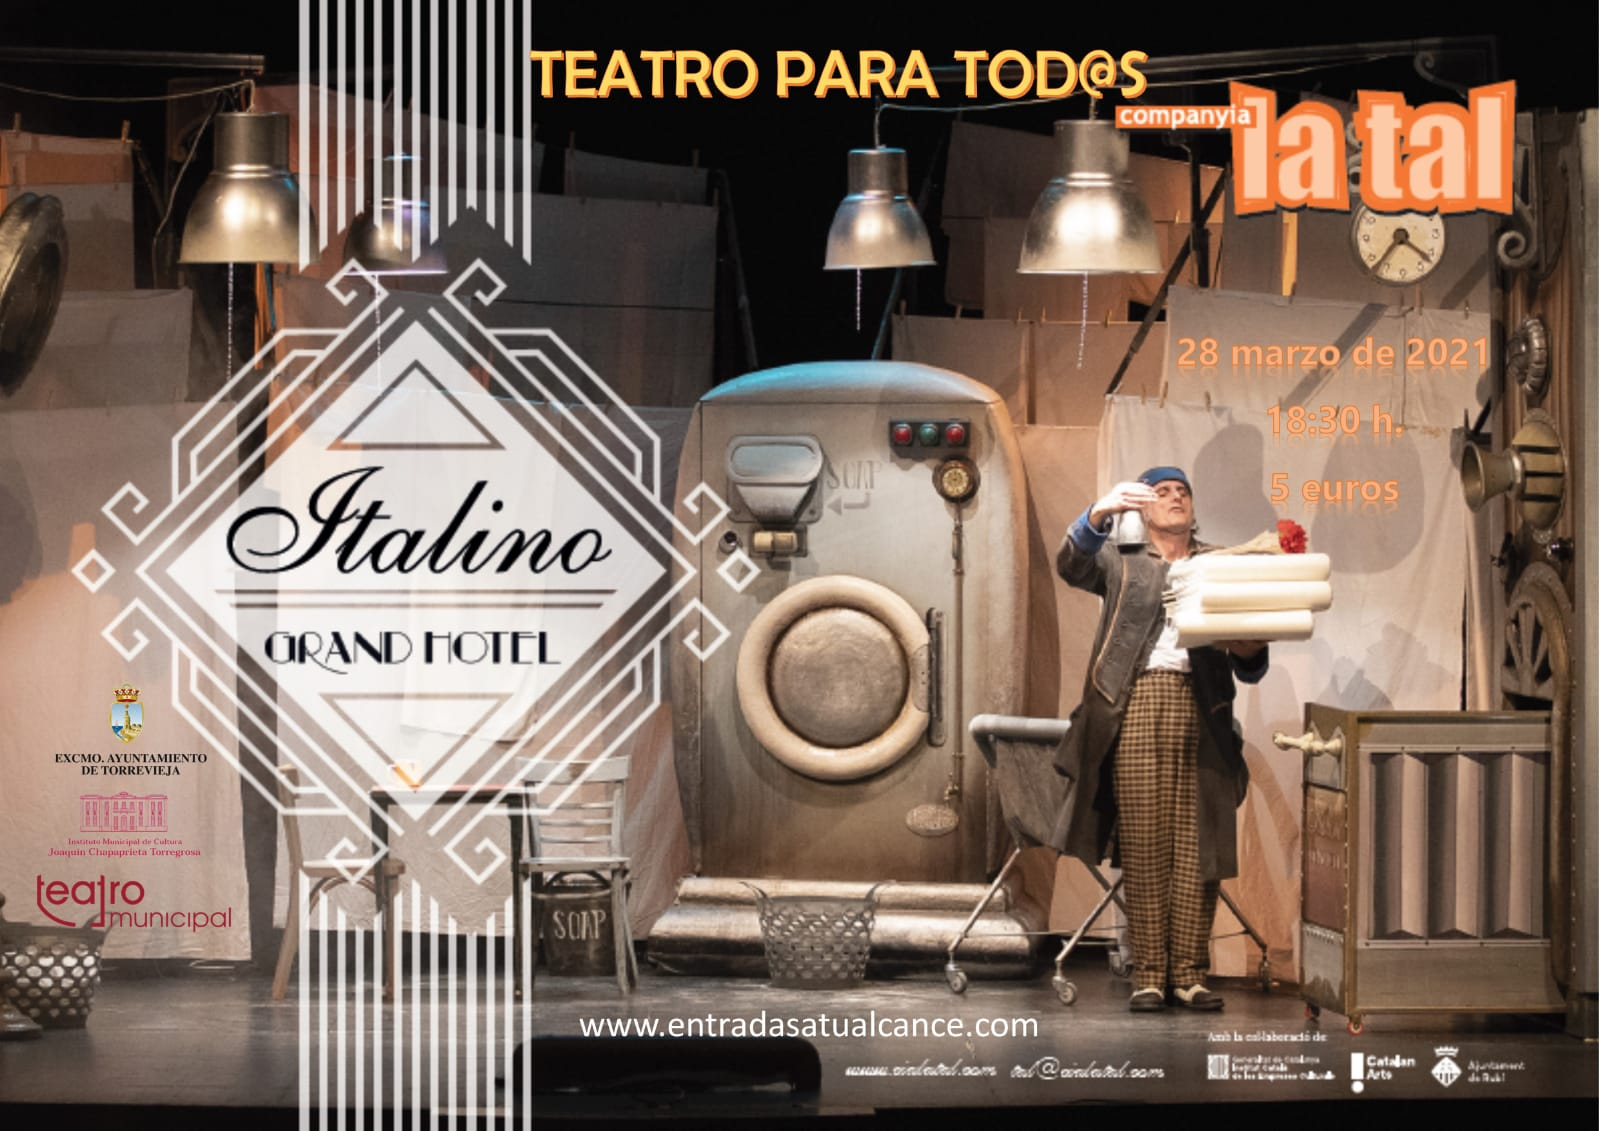 italino-grand-hotel-teatro-para-tod-s-6009797c8cd21.jpeg